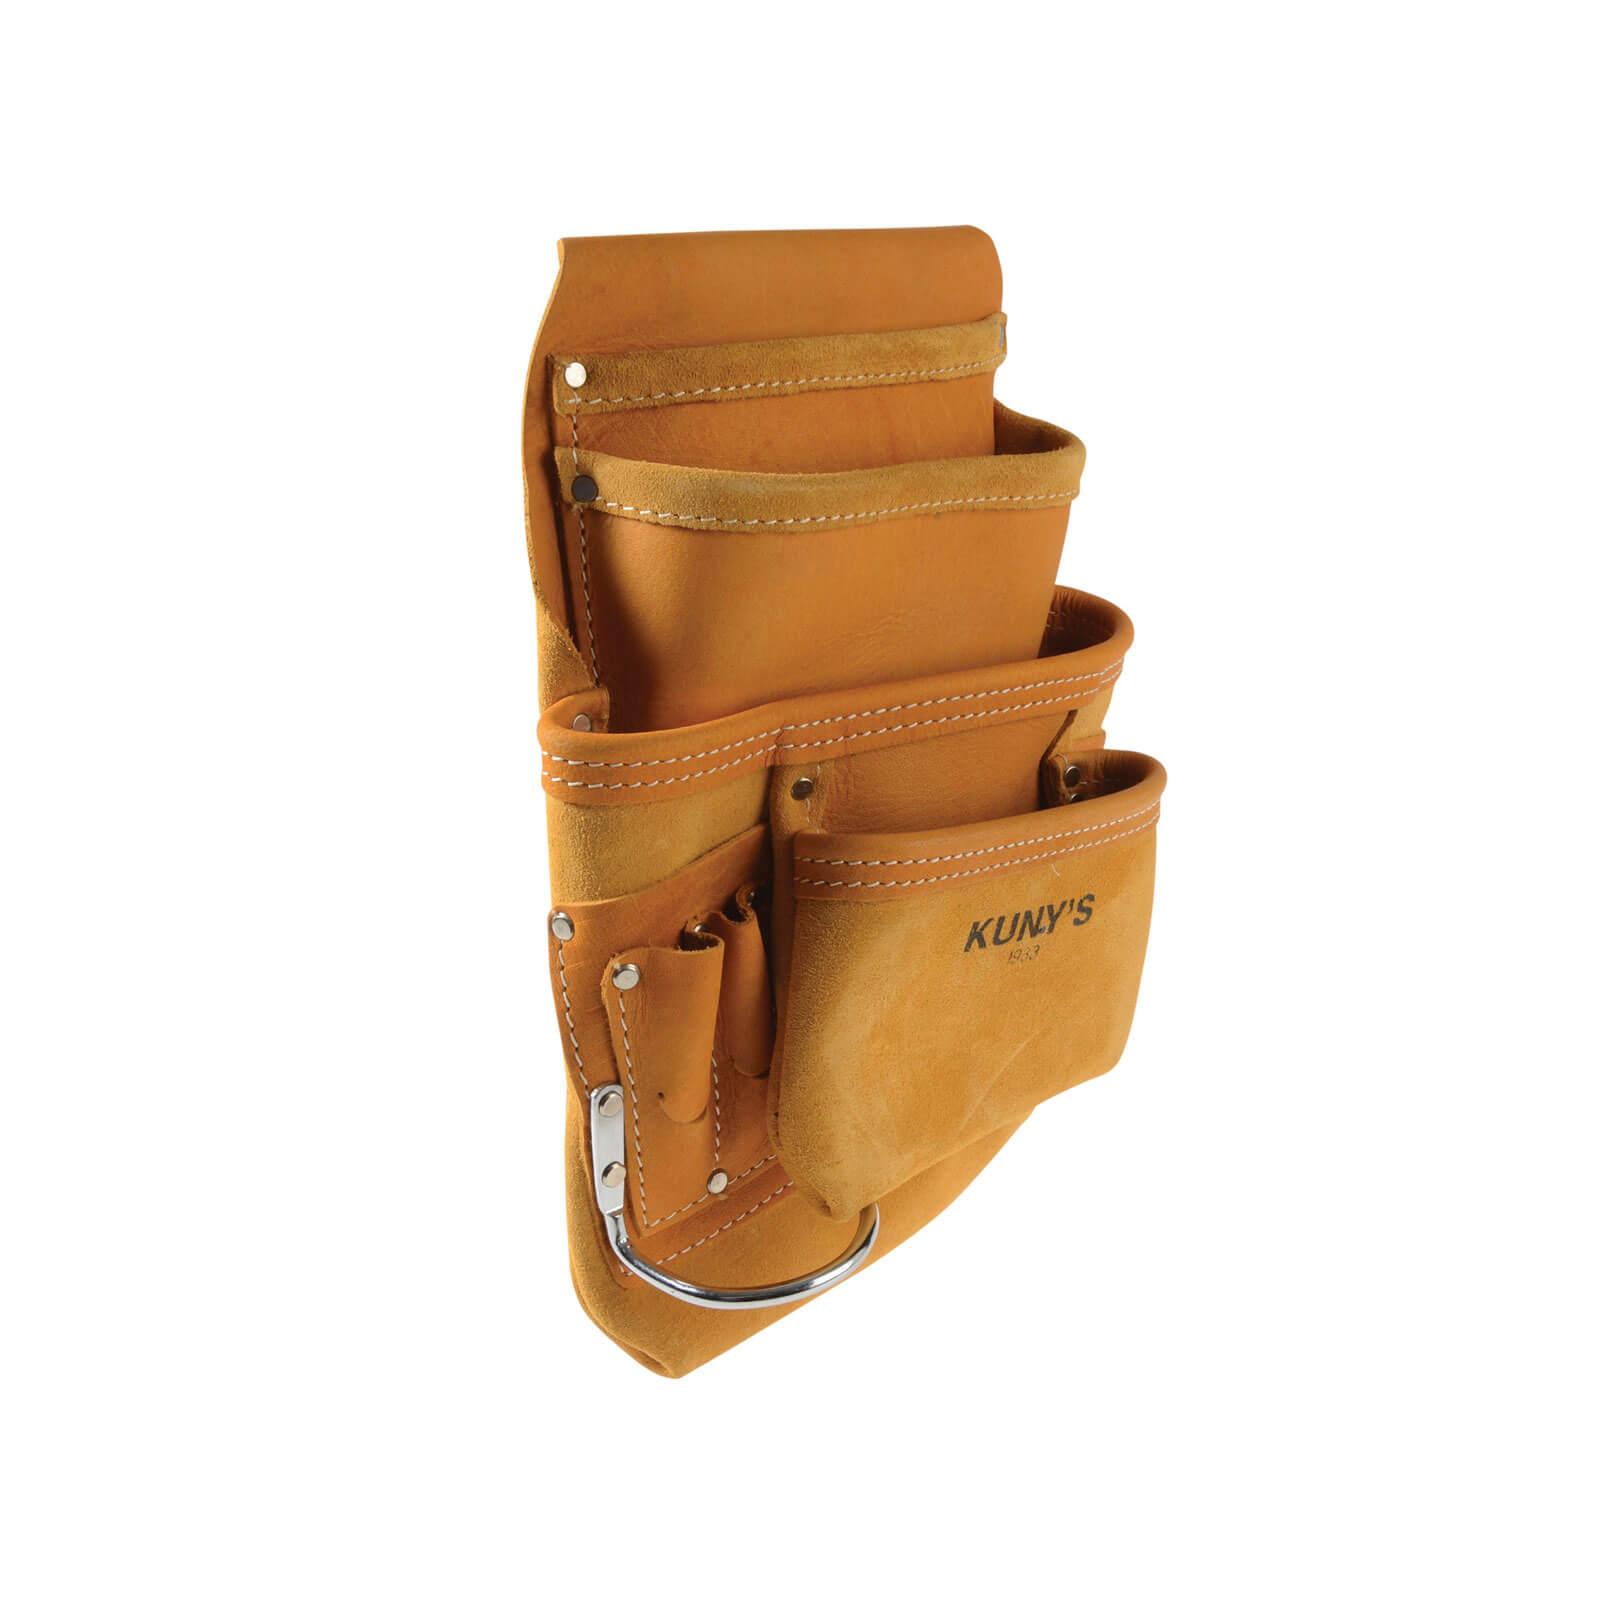 Kuny/'s api933 Carpenter/'s Nail and tool bag with 10 Pocket